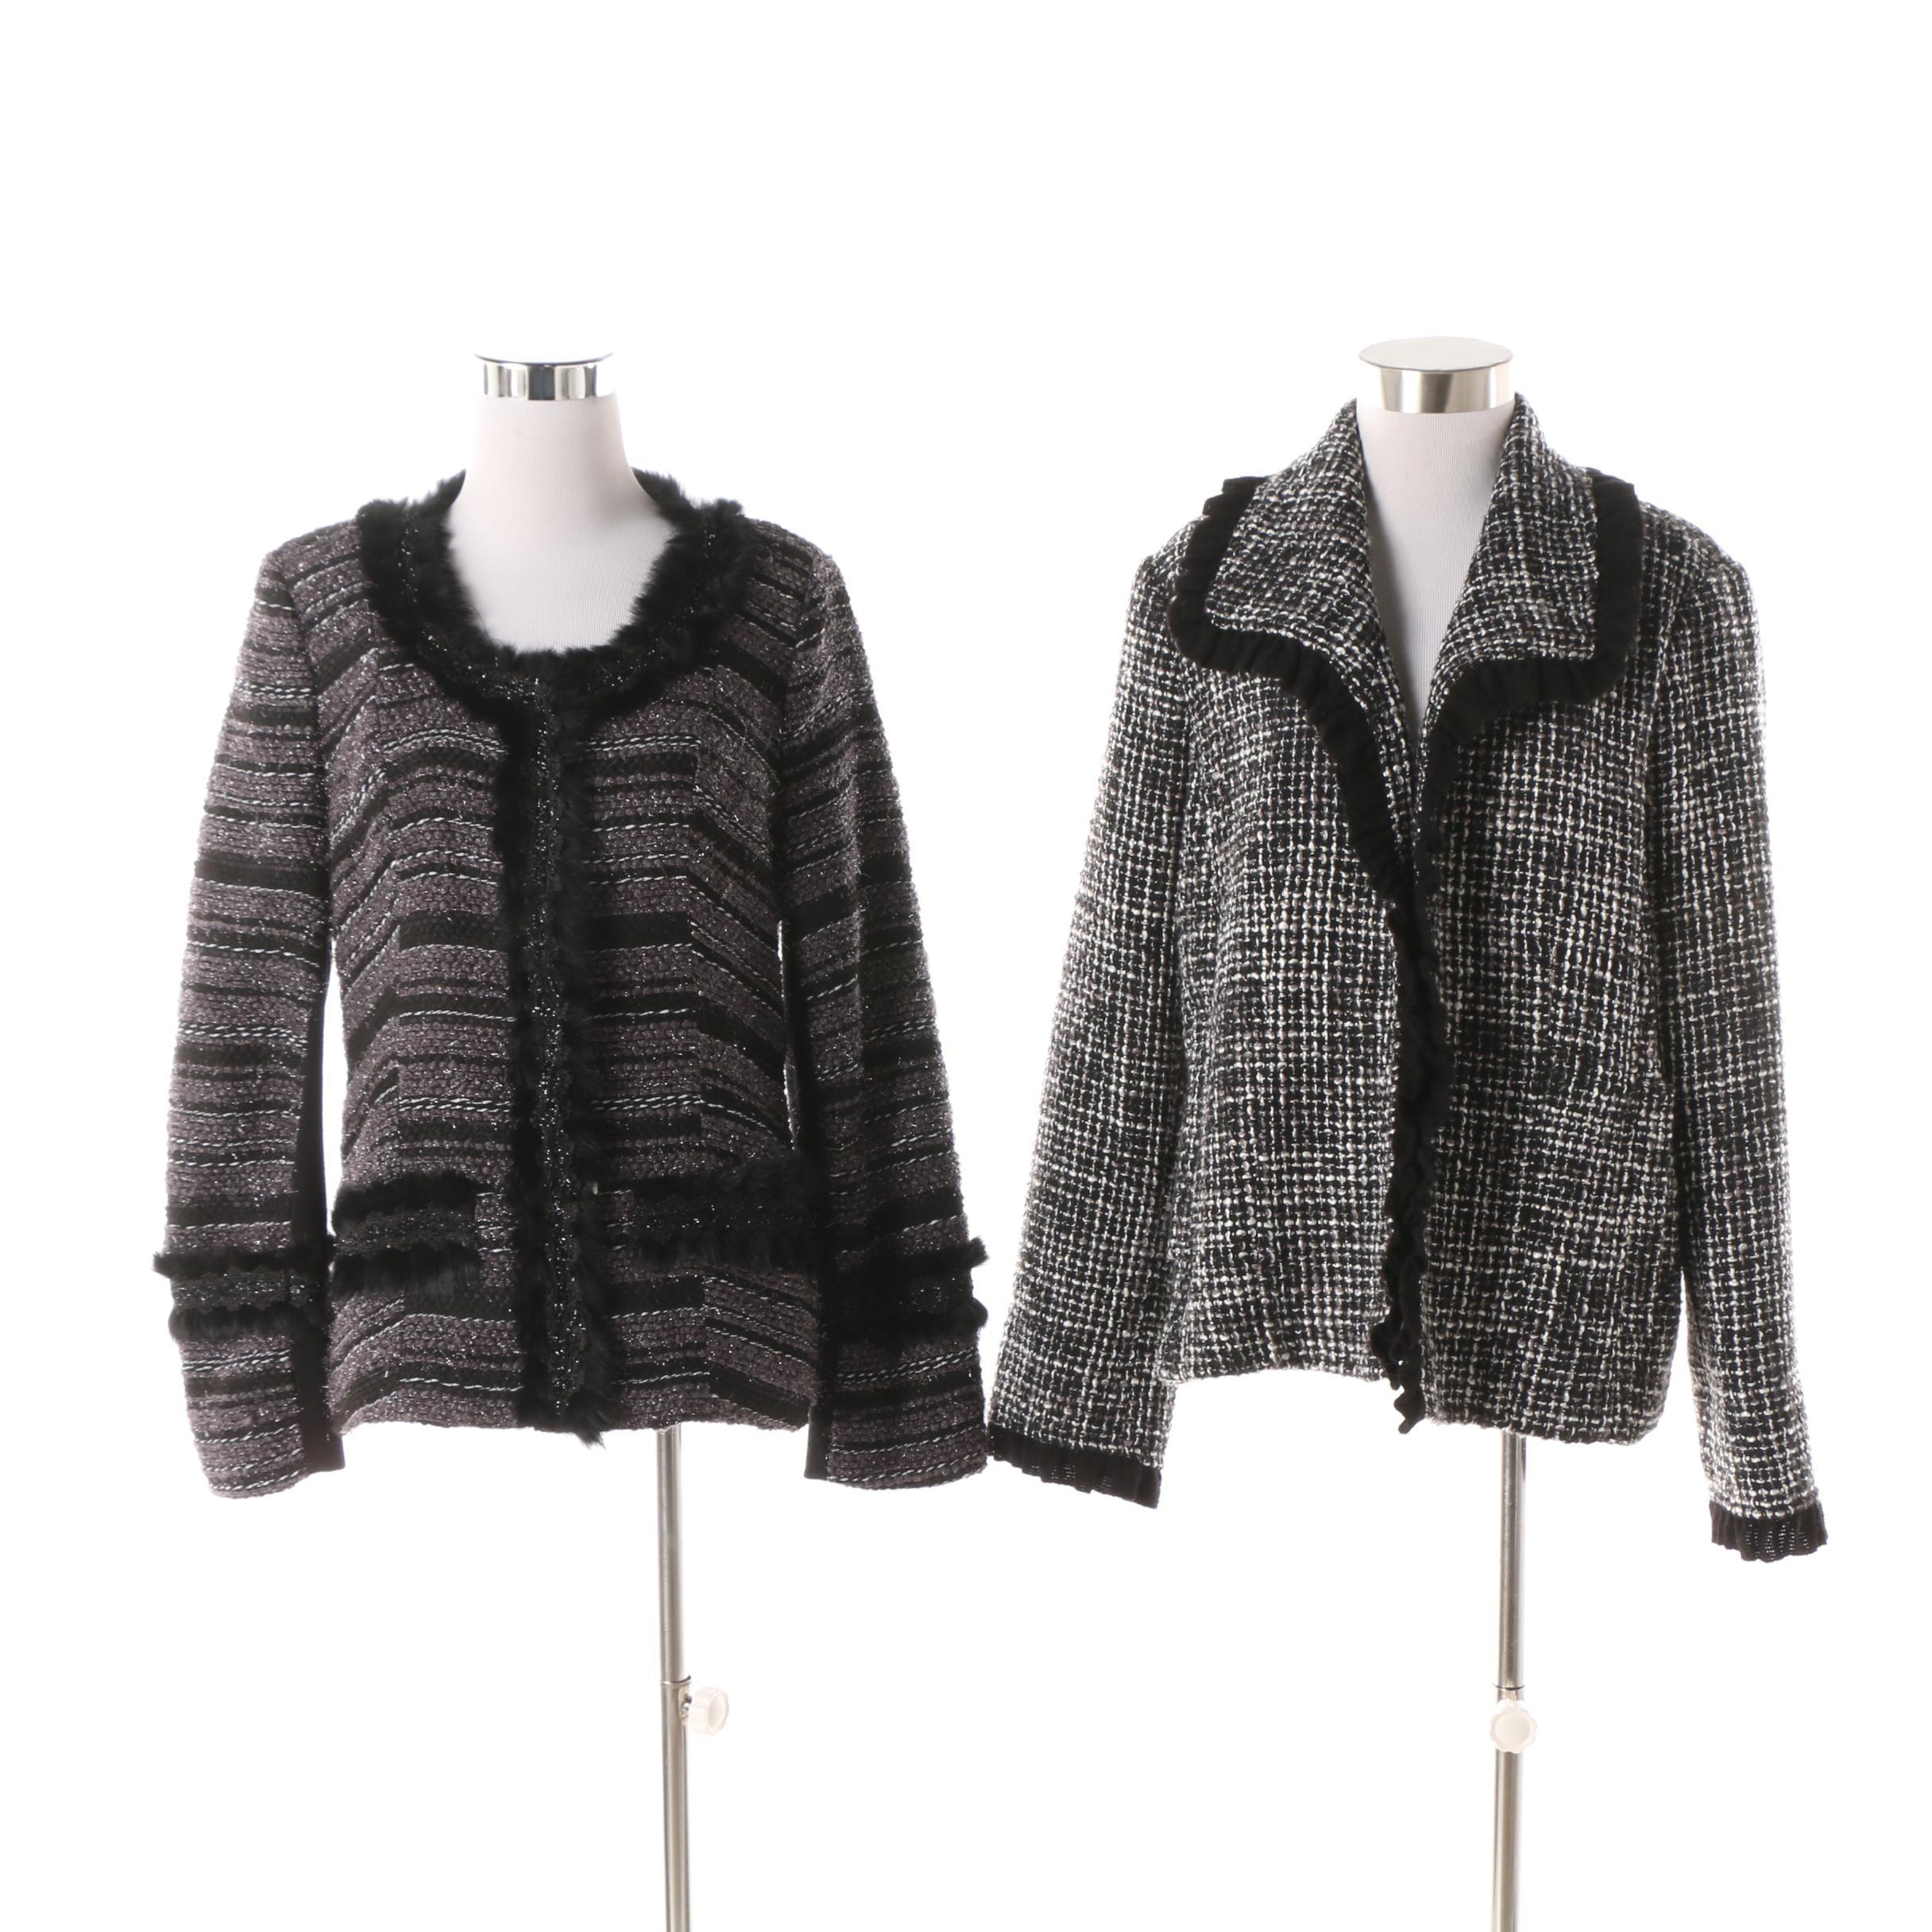 Women S Suit Separates Including Neiman Marcus Rabbit Fur Trimmed